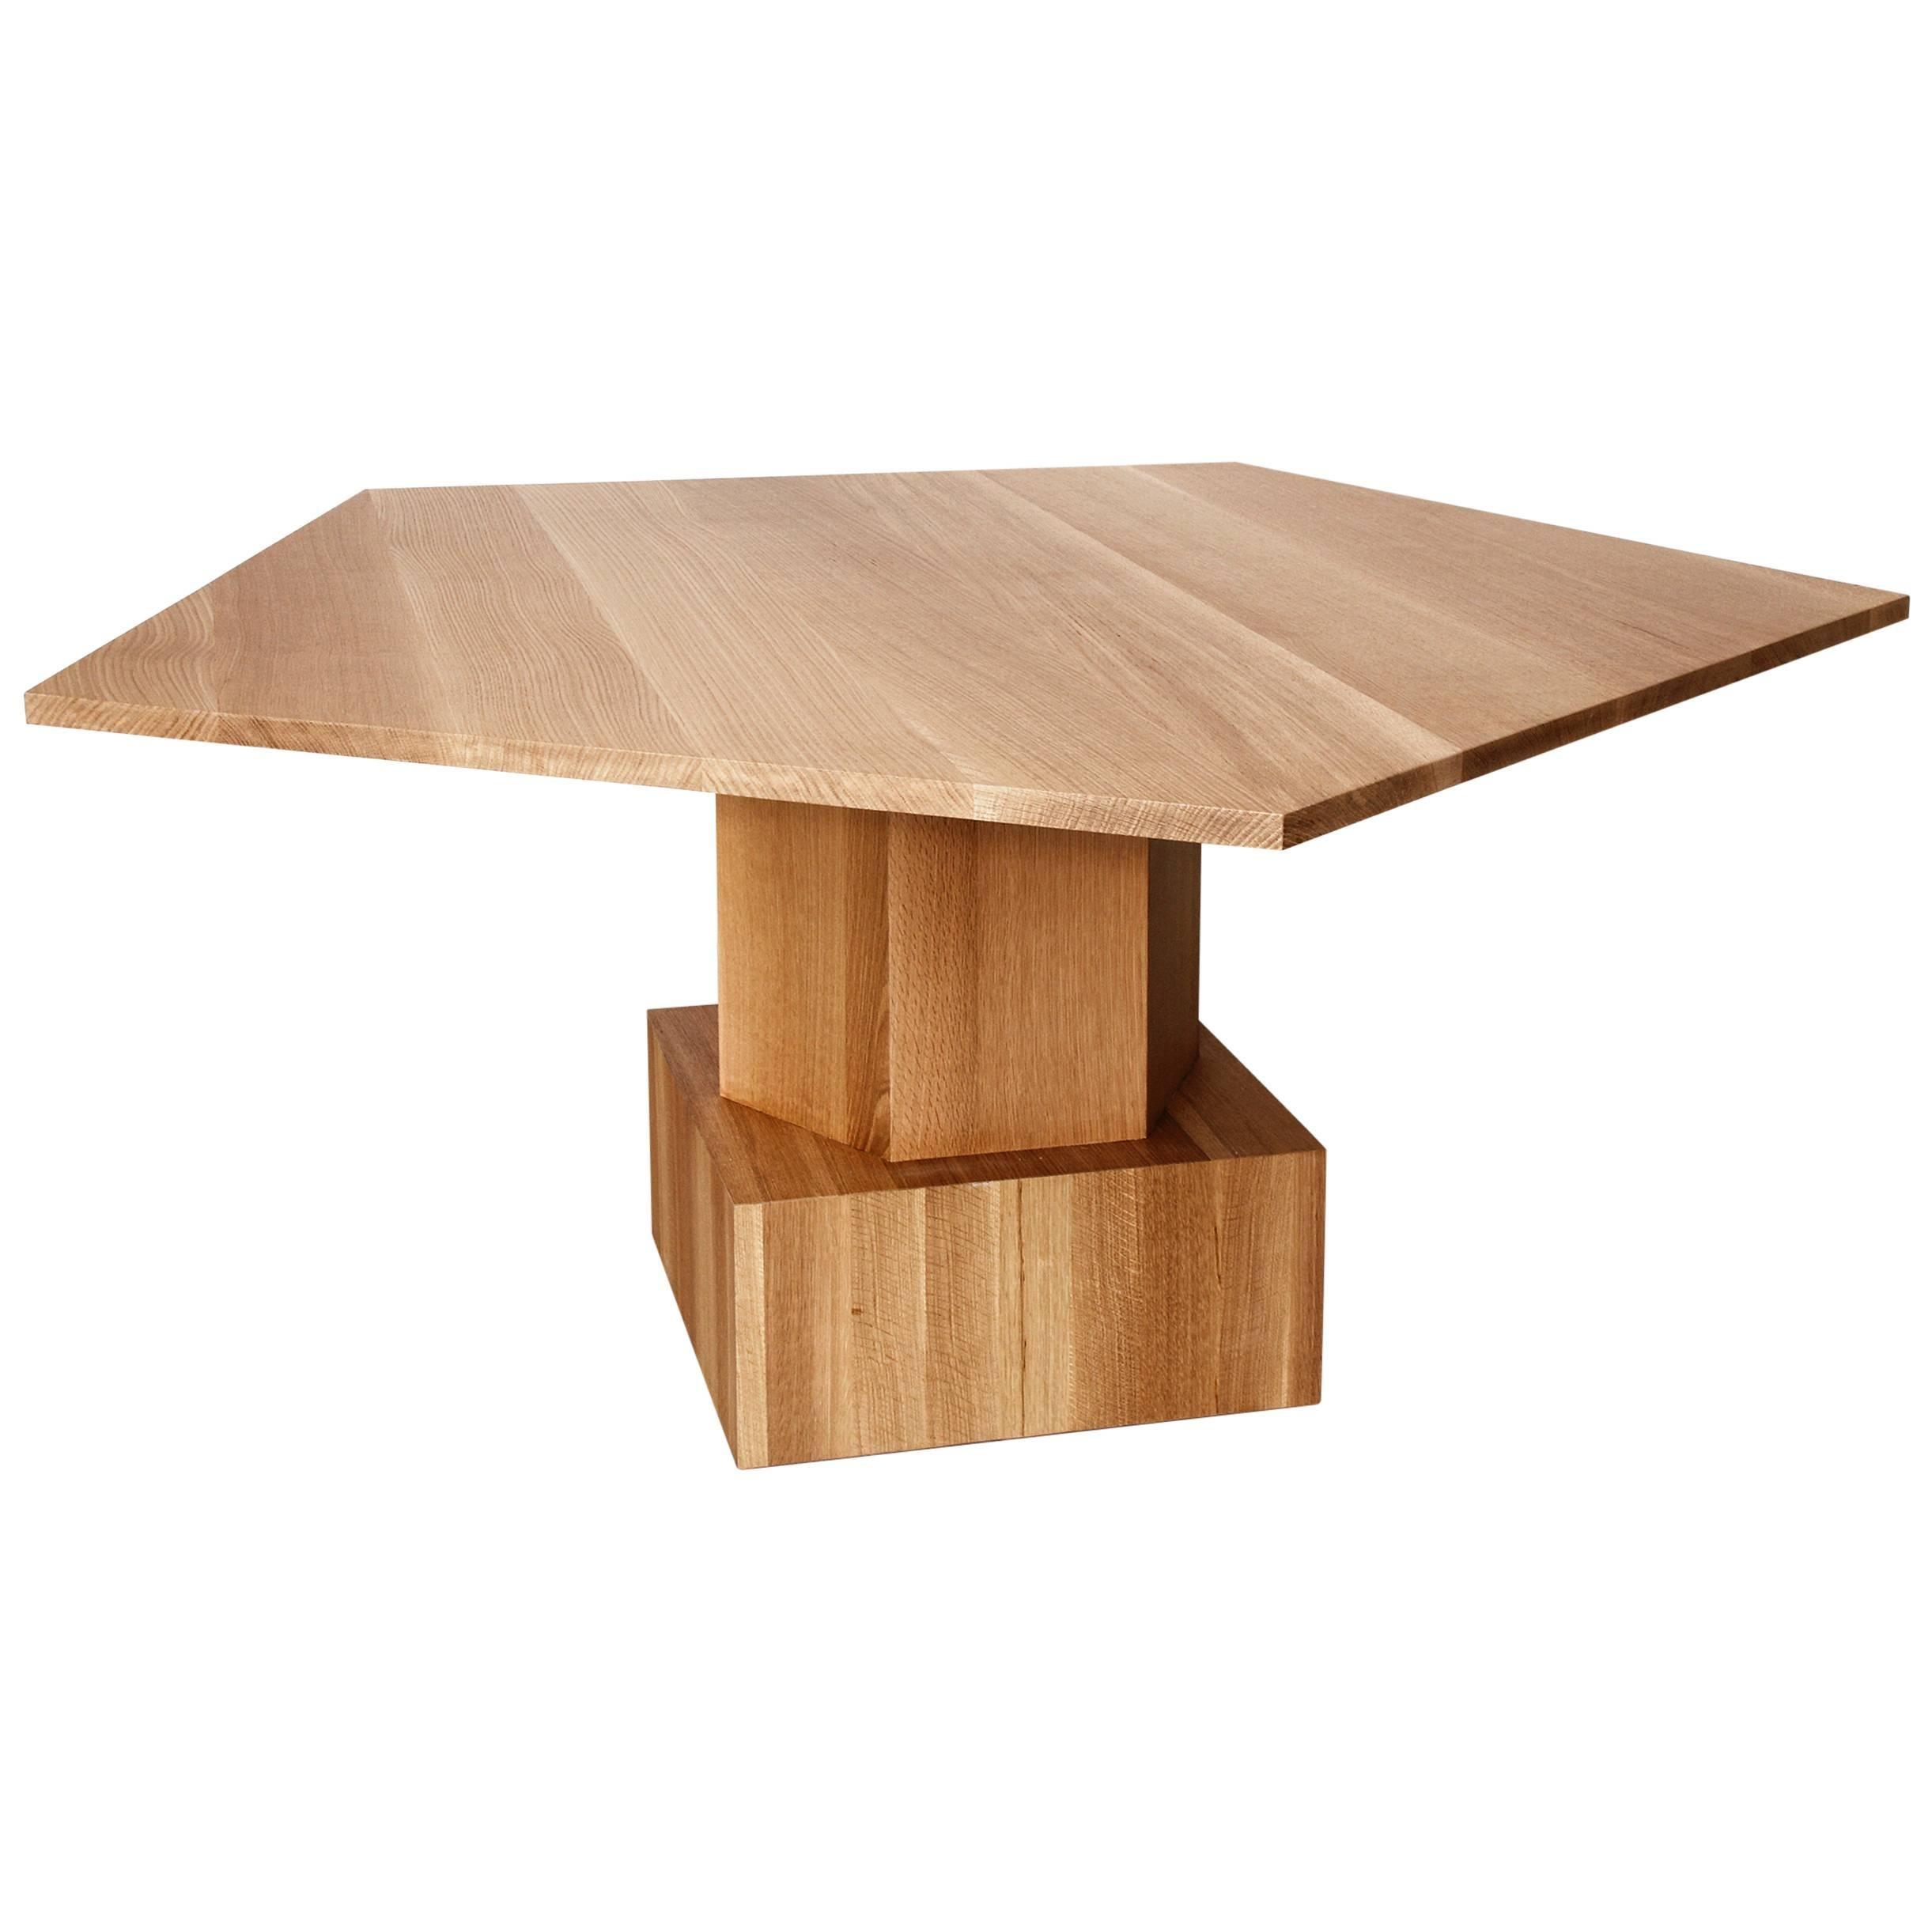 Walnut Dining or Center Table by Tinatin Kilaberidze